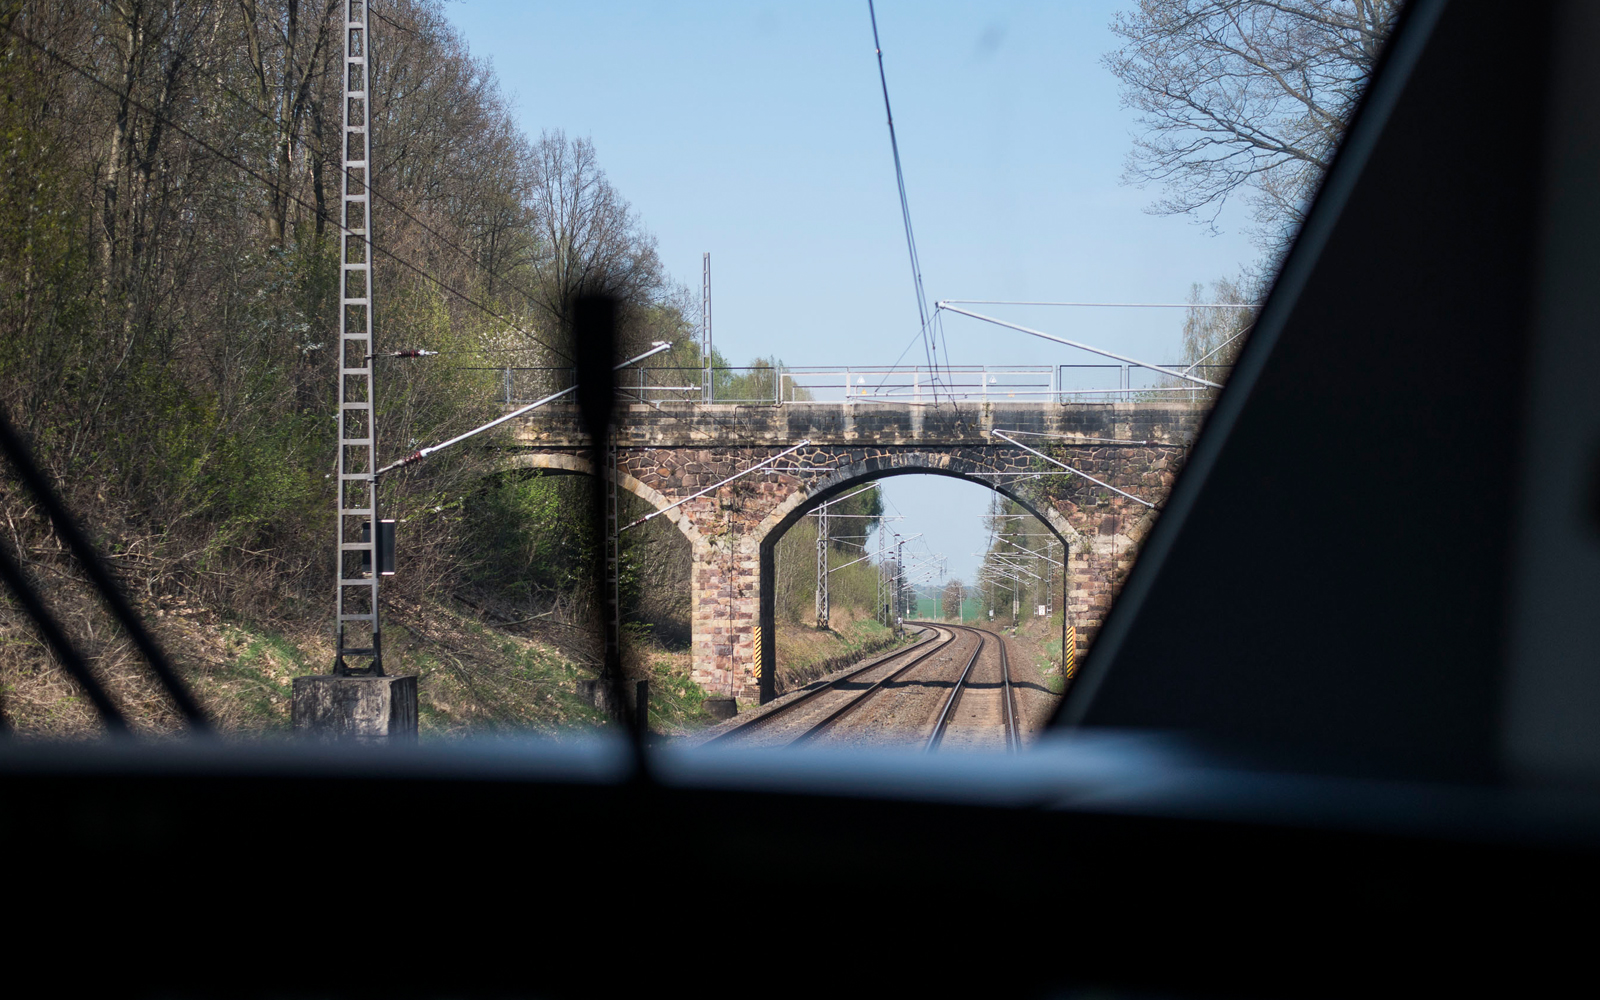 © Foto: Susann Wentzlaff | Brücke